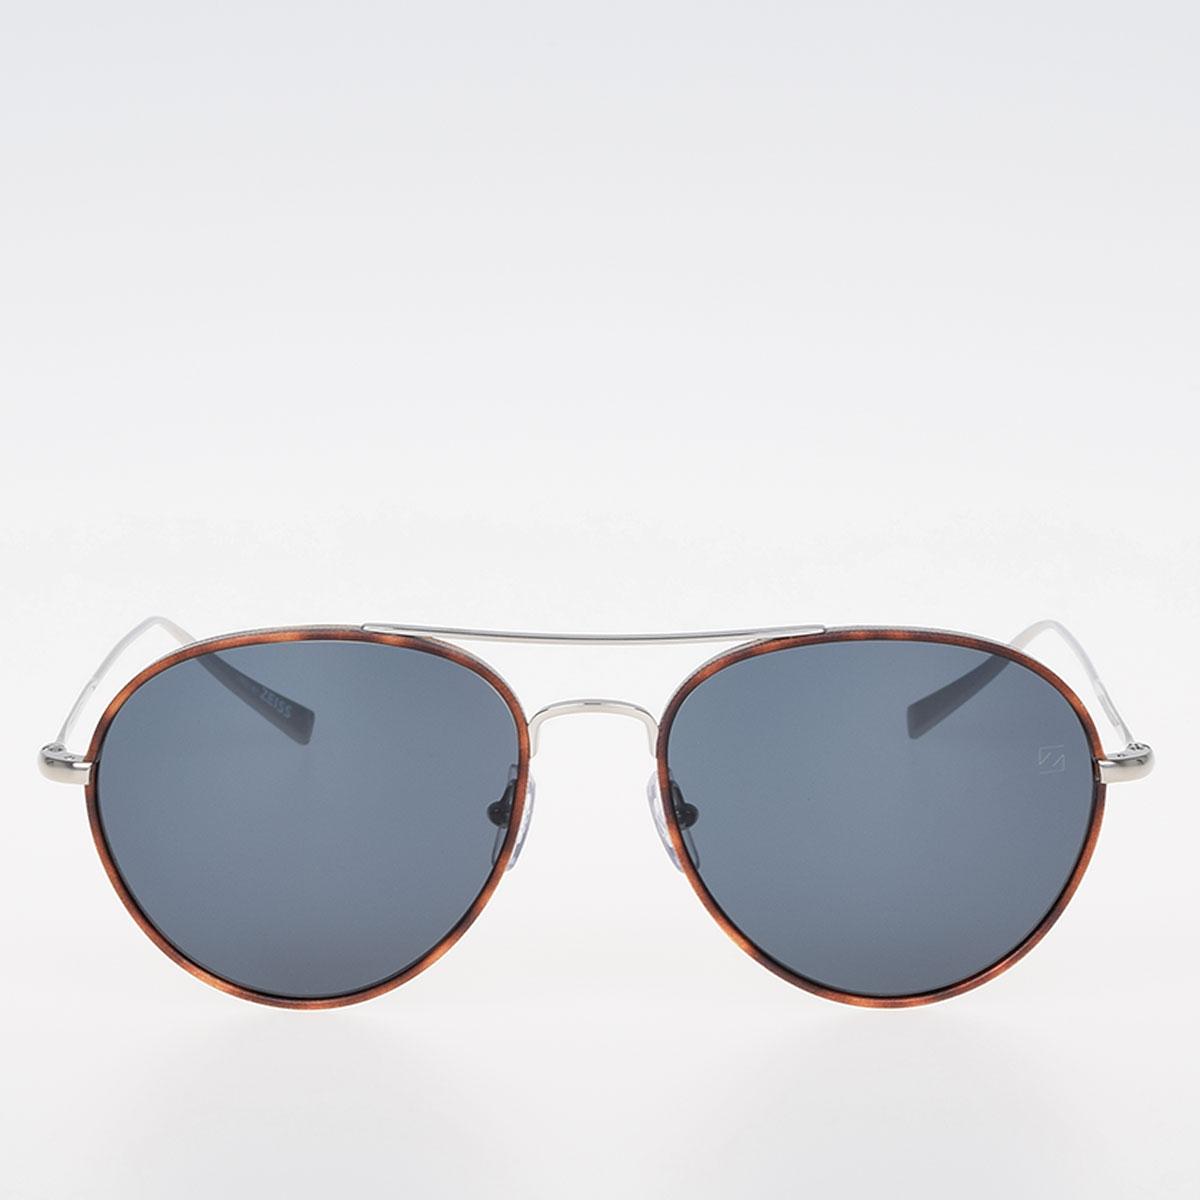 4b0d2dd5 Ermenegildo Zegna Men AVIATOR Sunglasses - Glamood Outlet